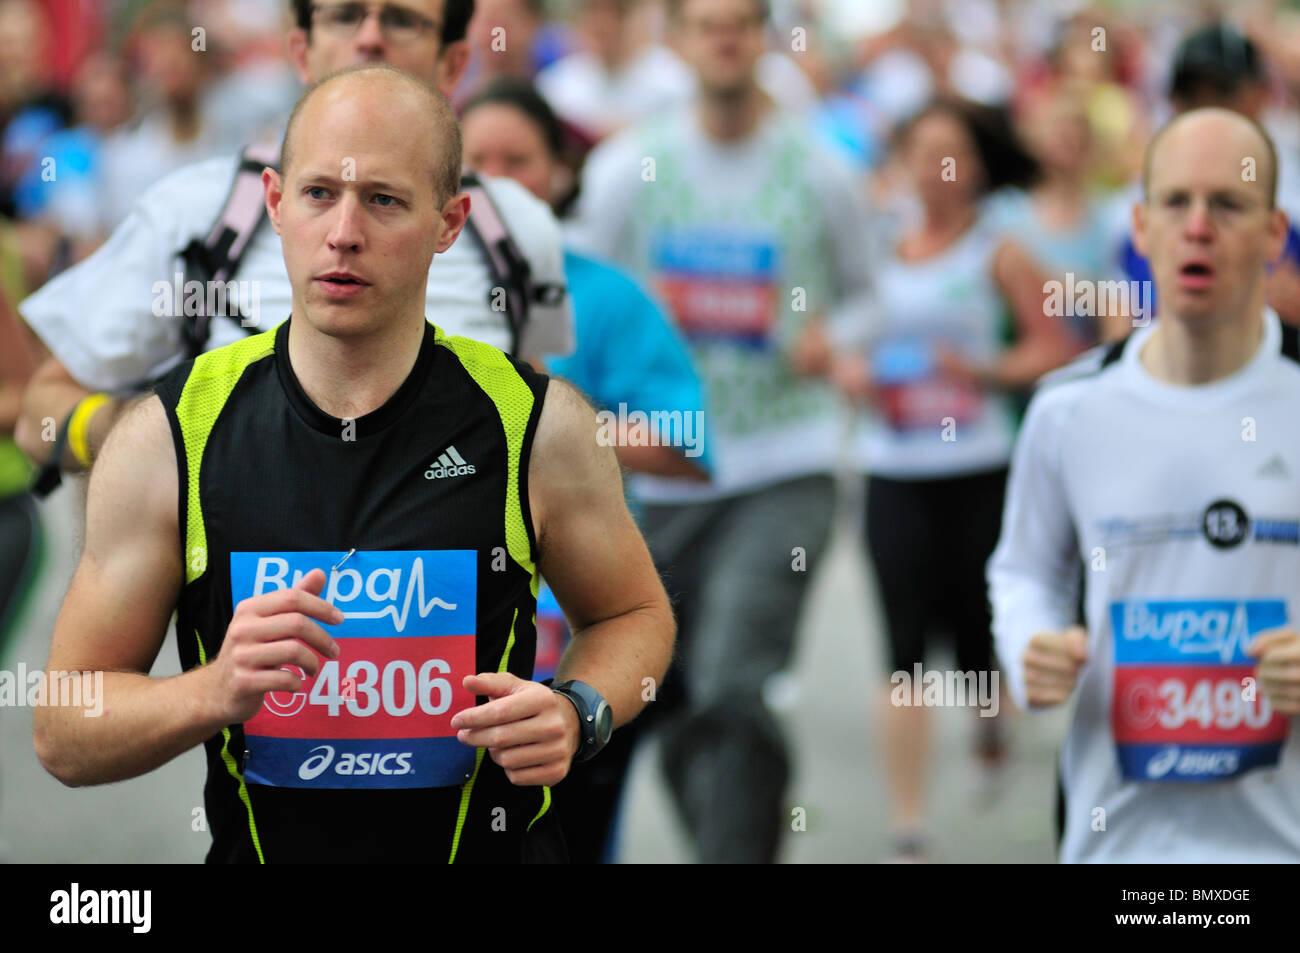 Mass participation running event, London, United Kingdom - Stock Image